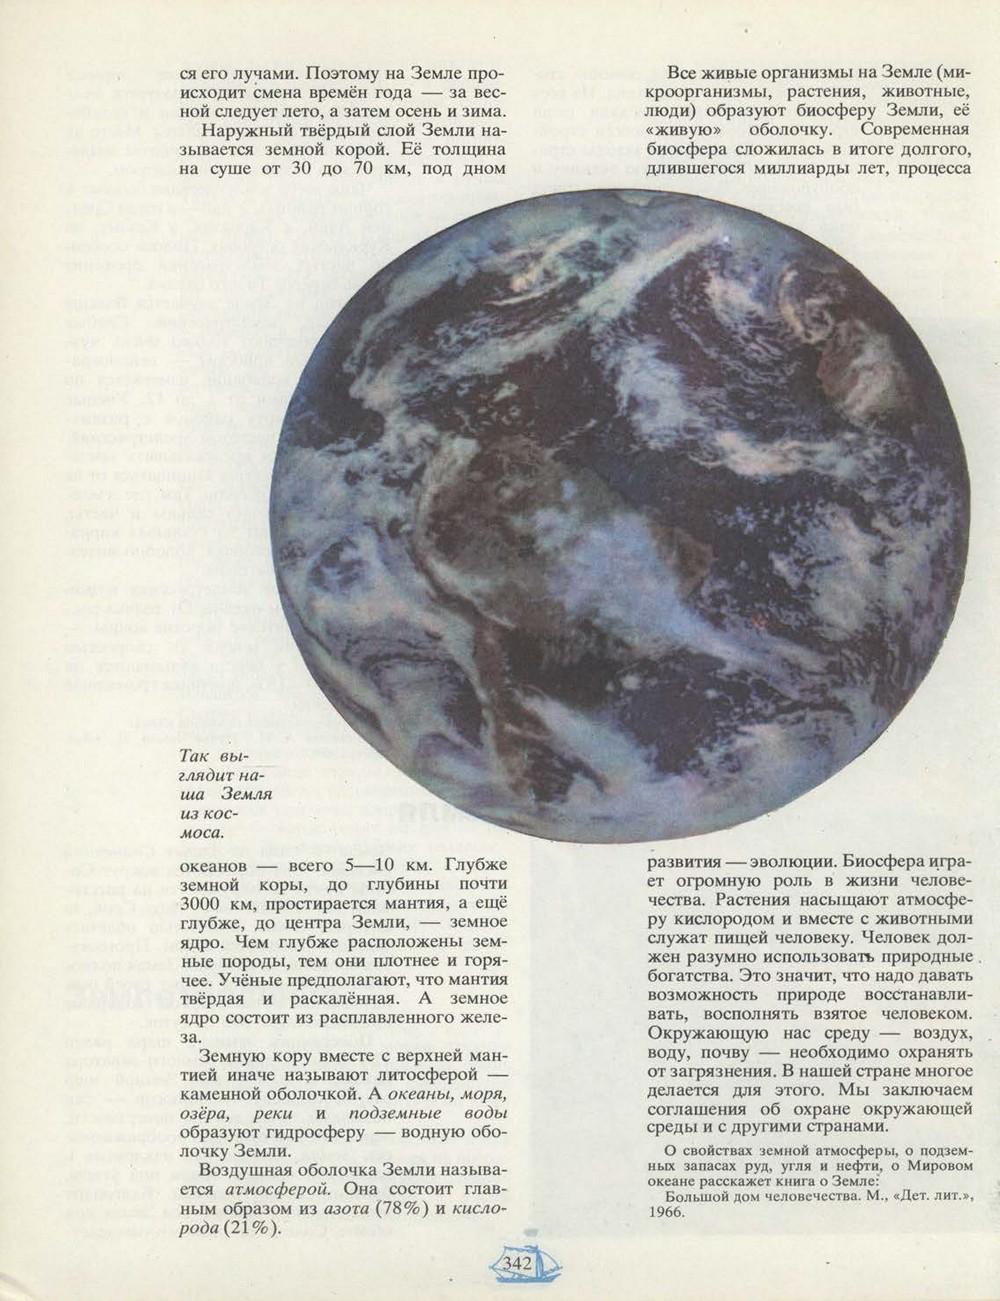 http://i2.imageban.ru/out/2013/12/15/a8349cad5eab98773e64a554047087d6.jpg